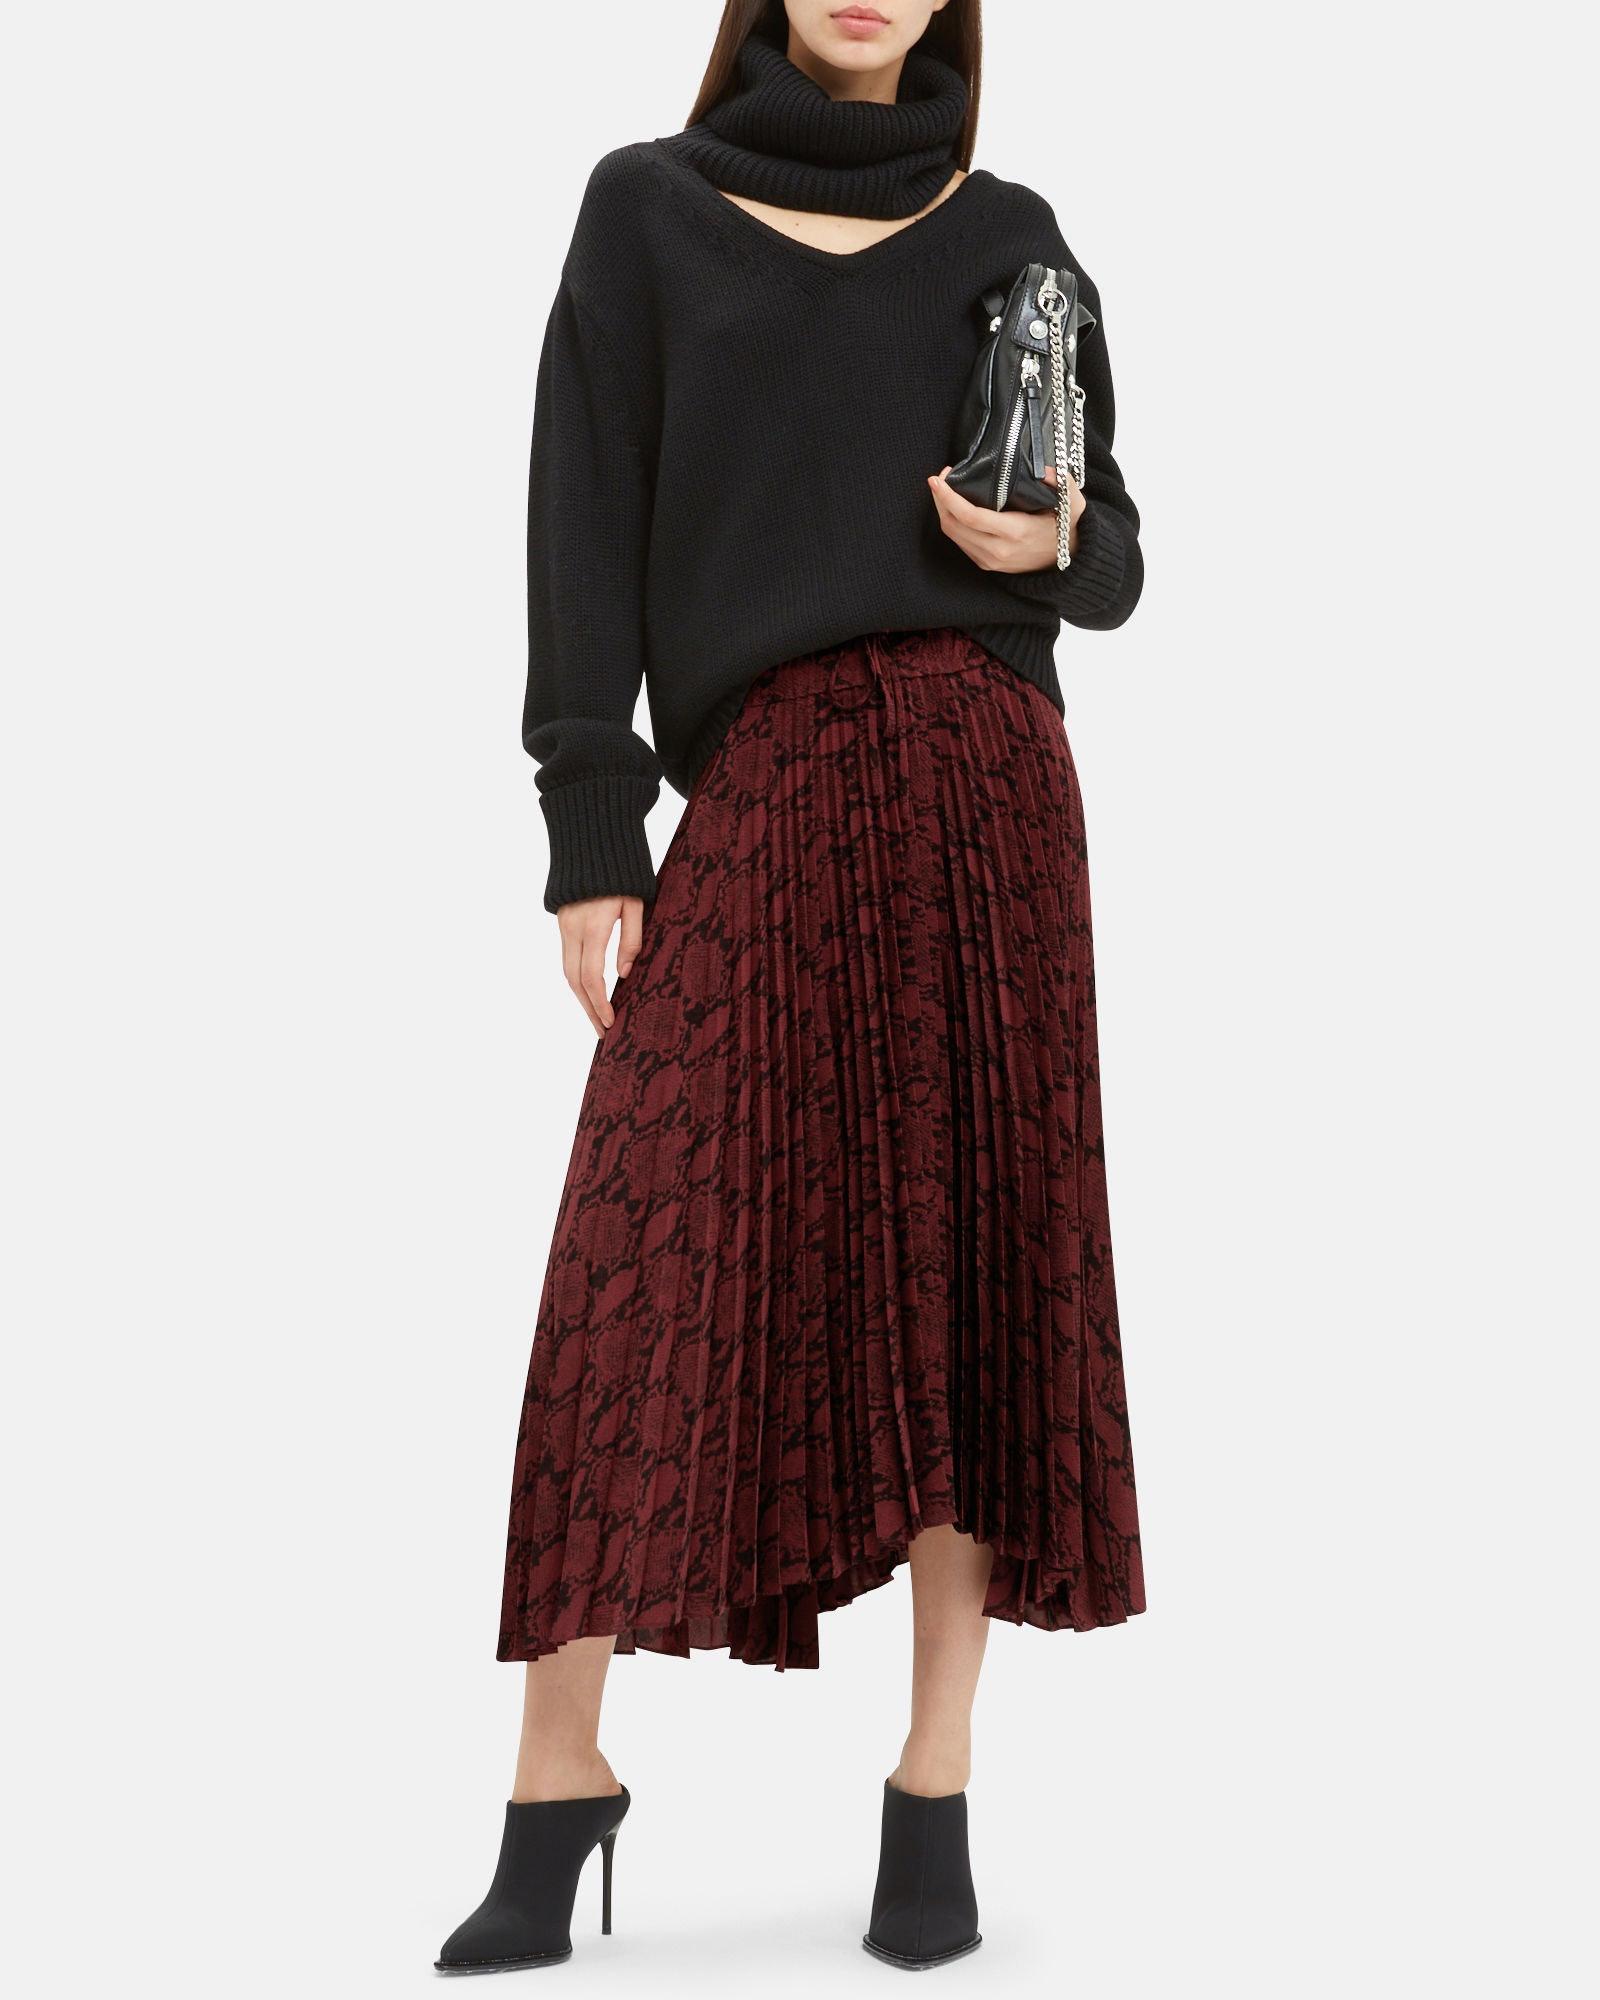 2c57da033f Zara Faux Leather Skirt Burgundy – DACC